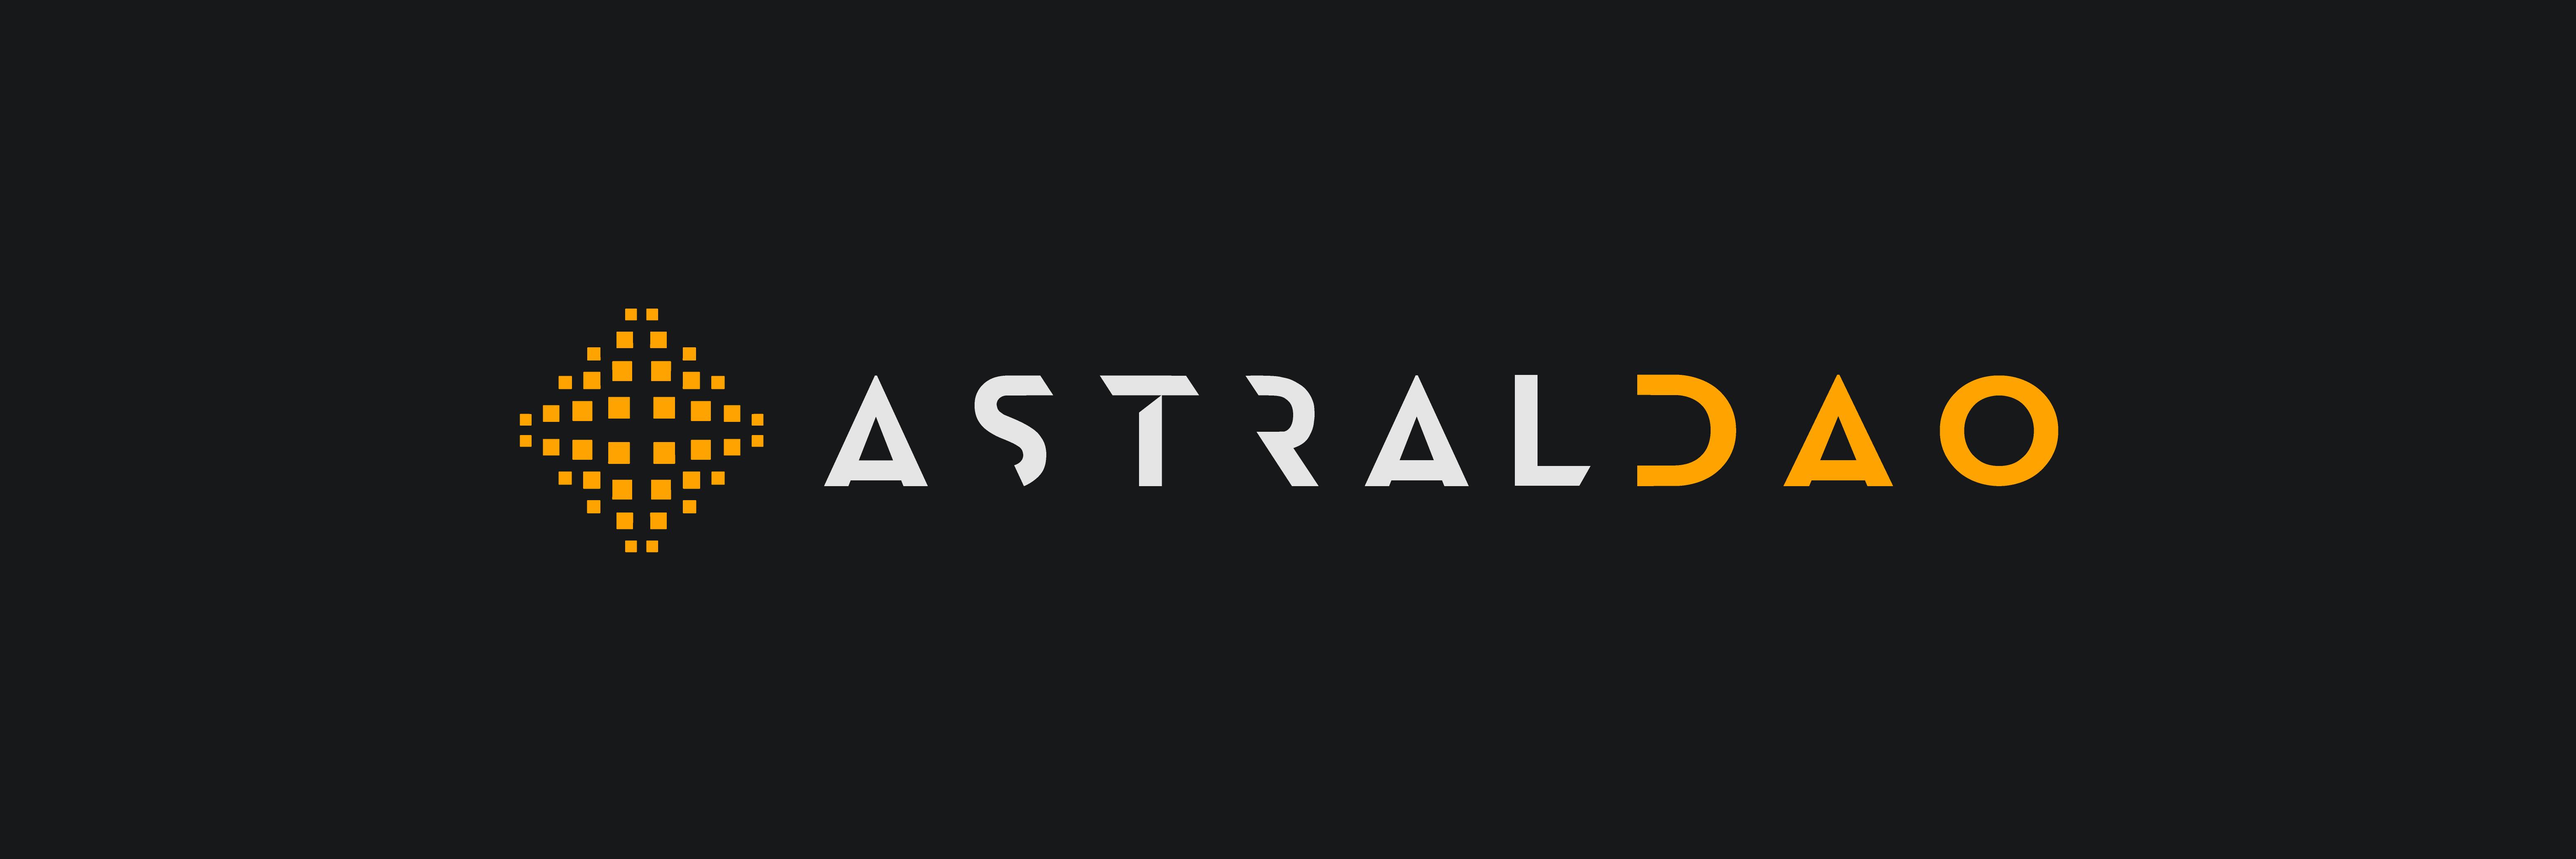 astralDAO showcase